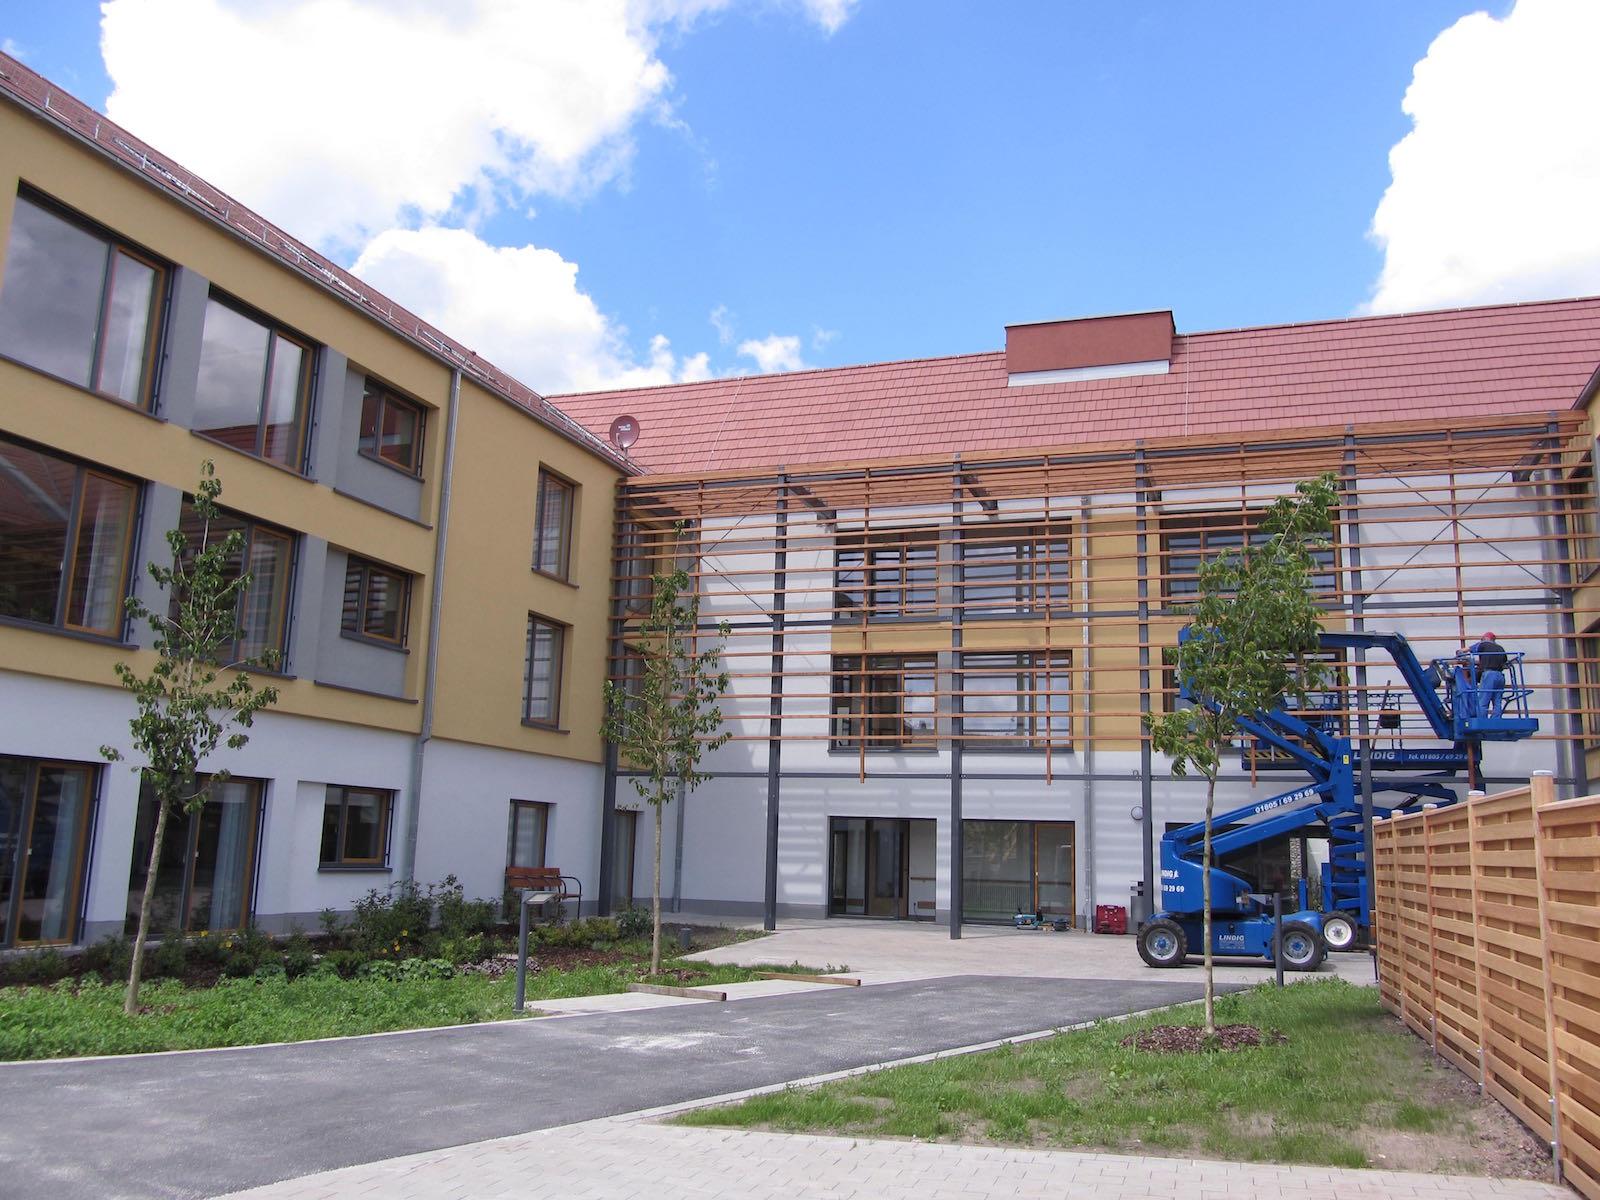 altenpflegeheim-creuzburg-3